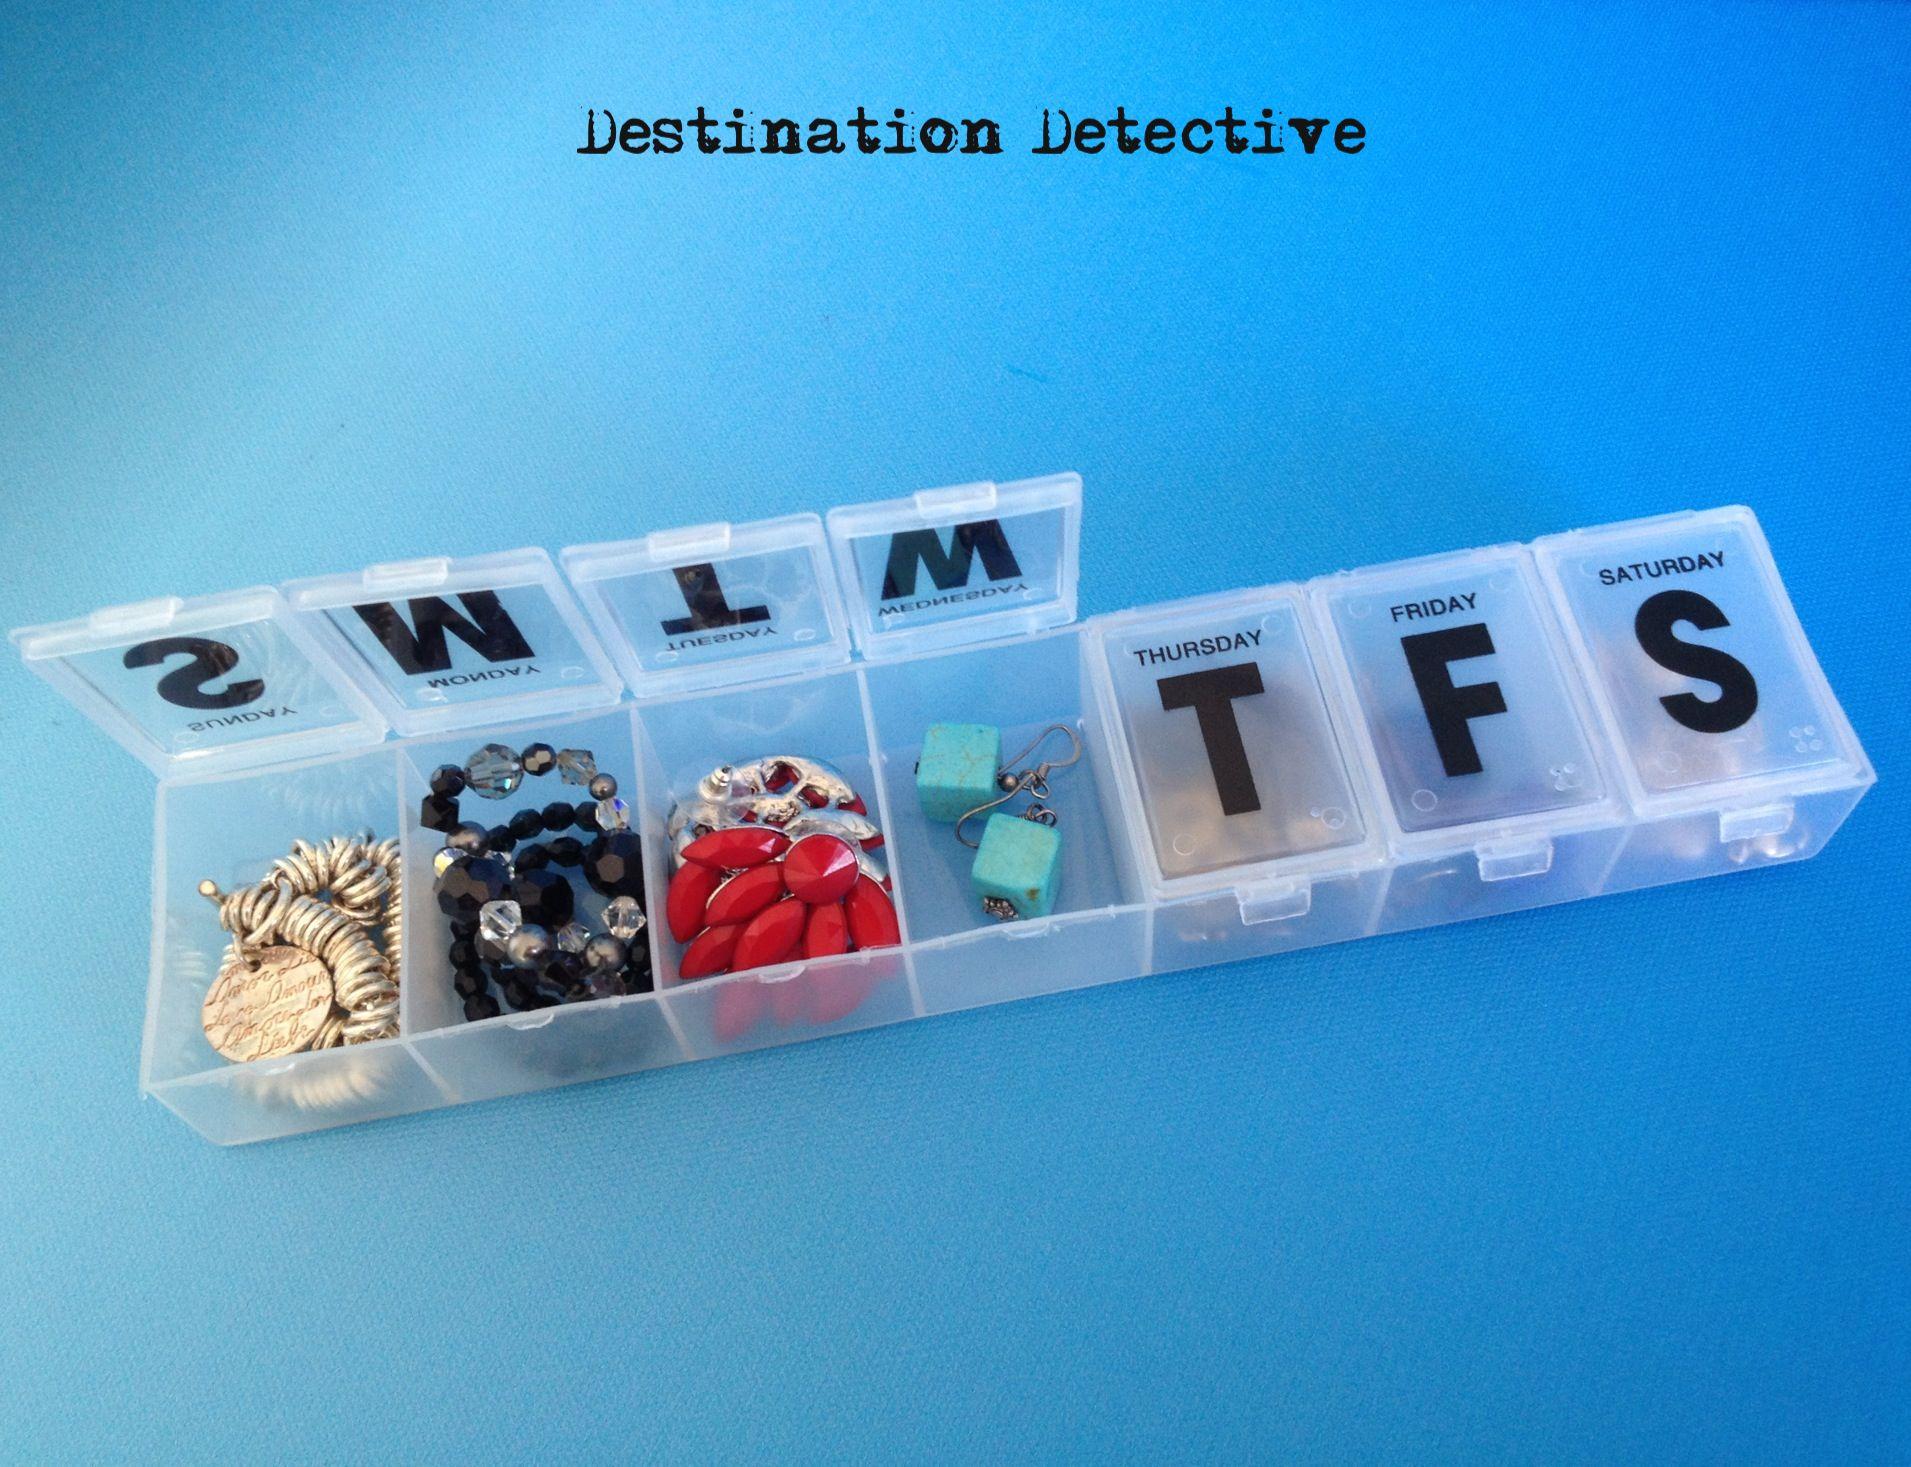 Pill sorter as travel aid